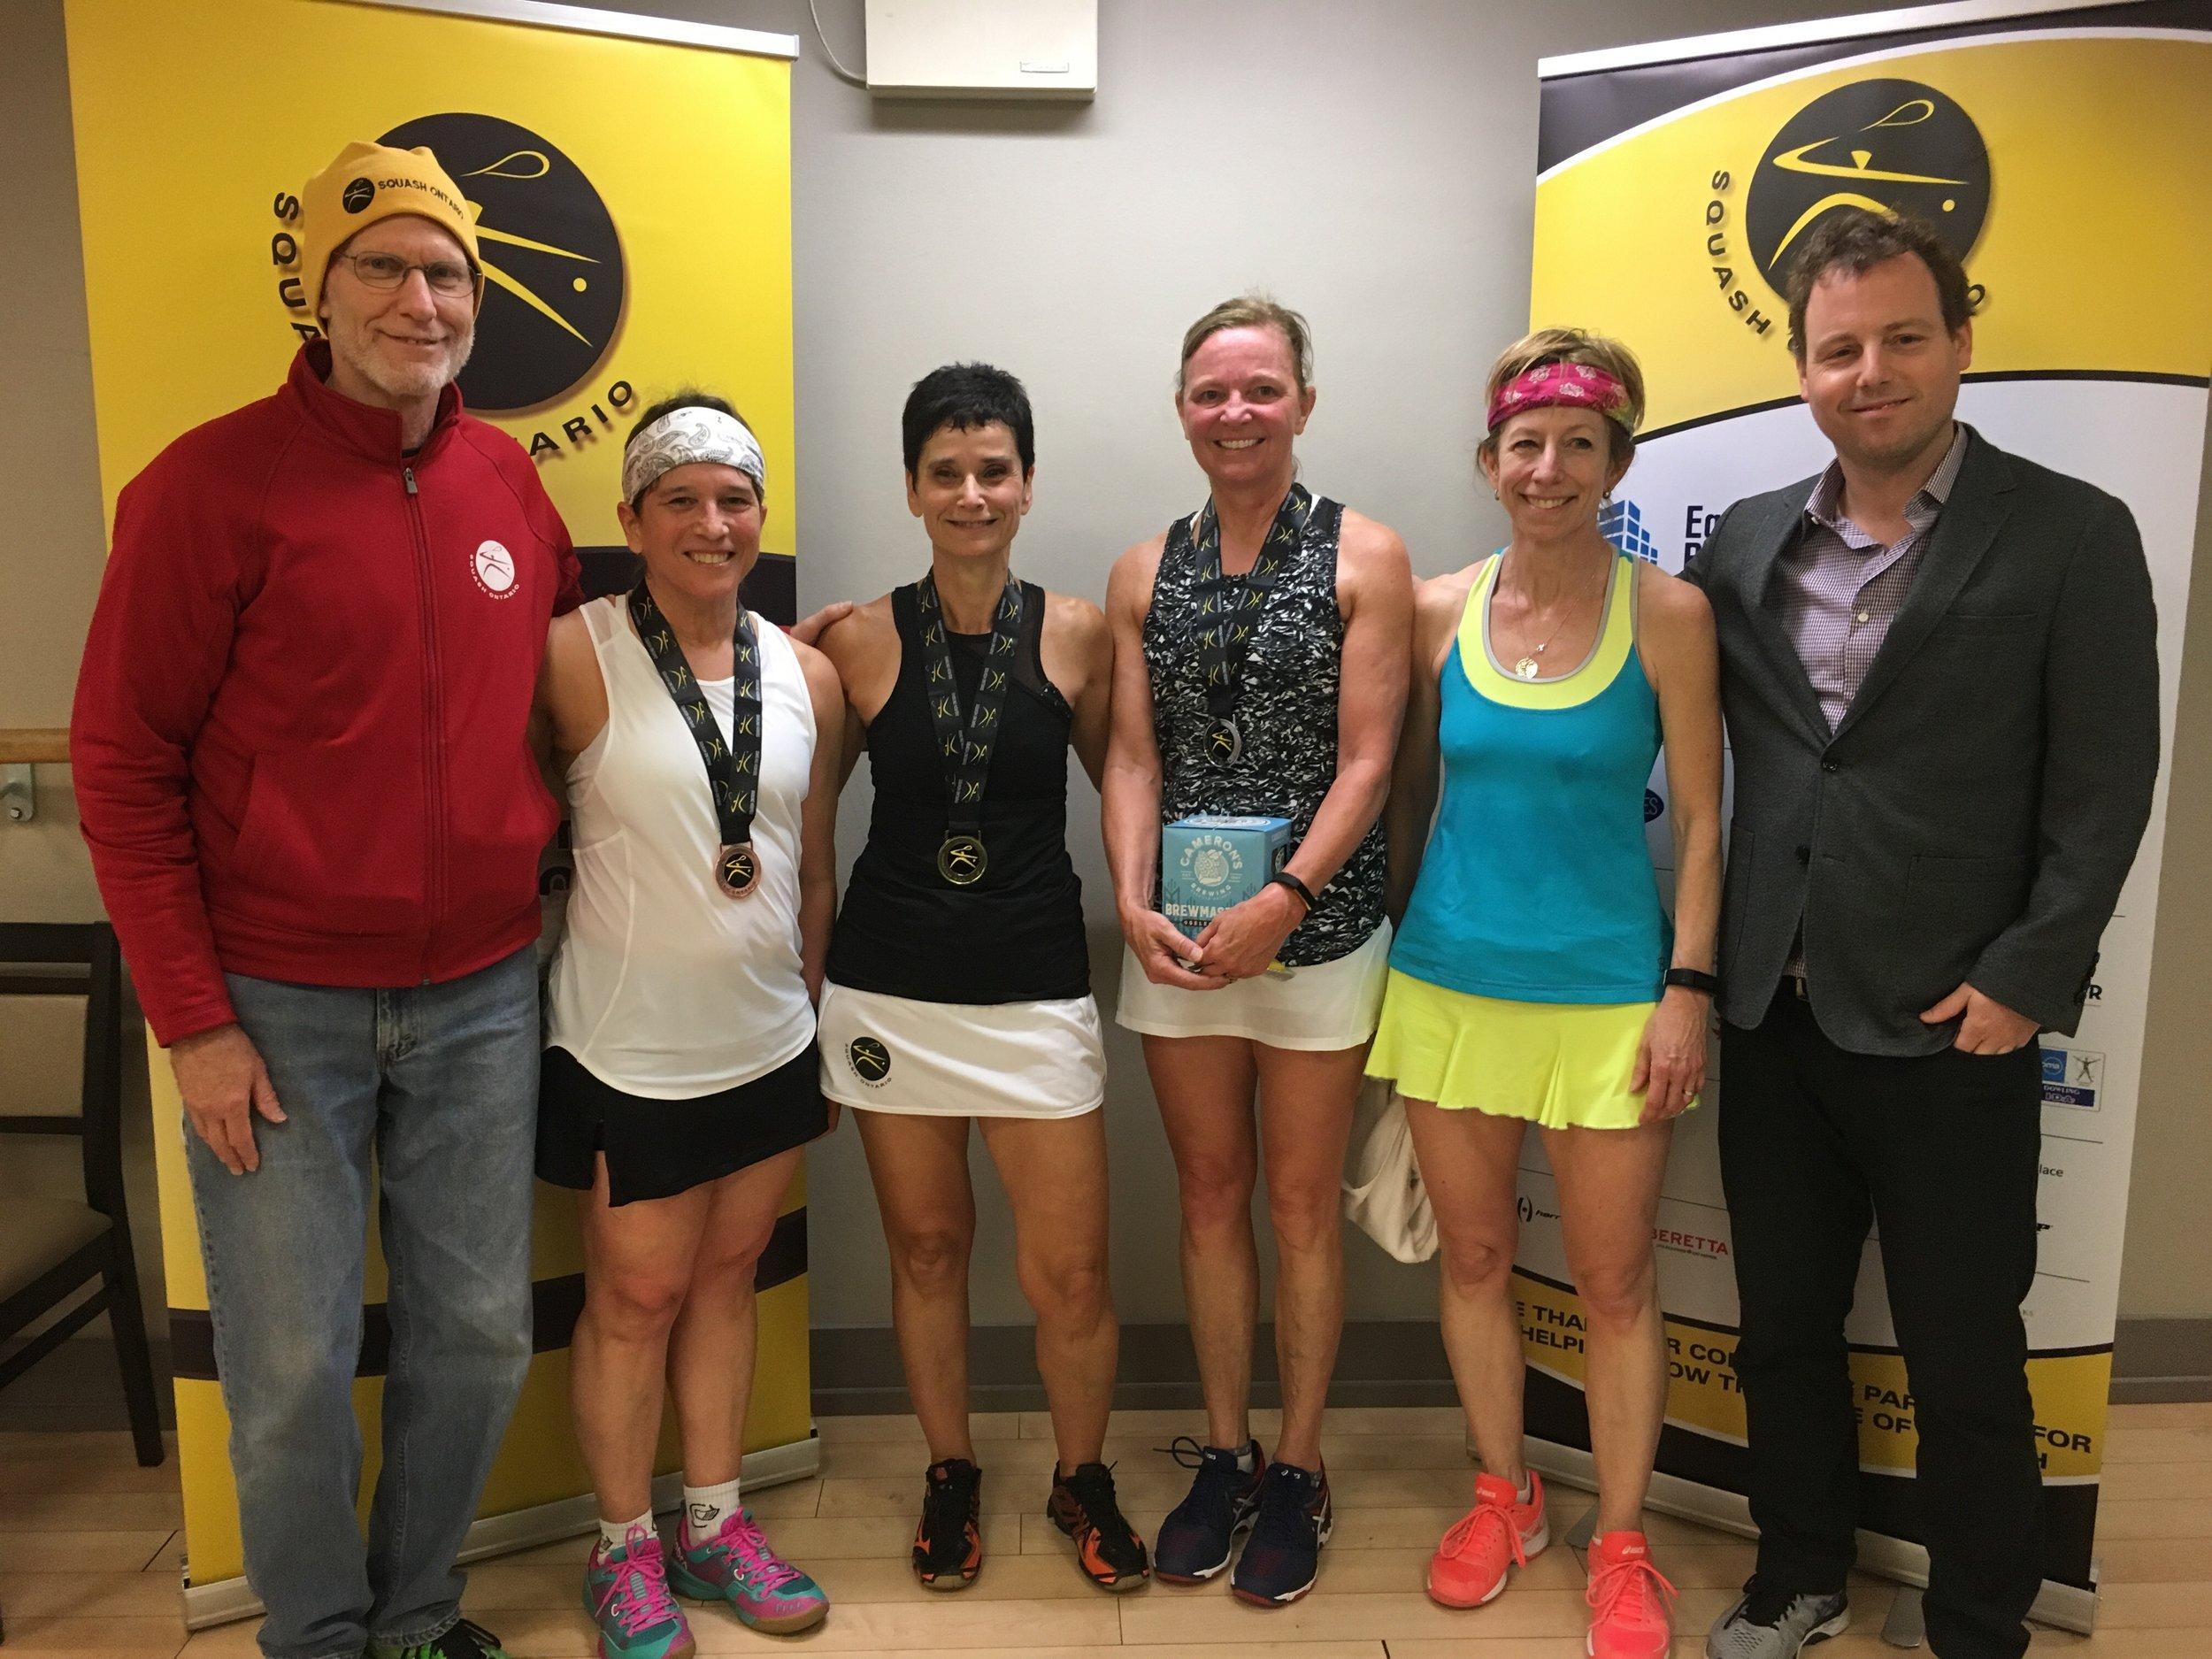 L-R: Coach Rob Brooks, Lorraine Tetreault, Elka Markus, Kathy Cowper, Alison Le Ber, Squash Ontario's Jamie Nicholls